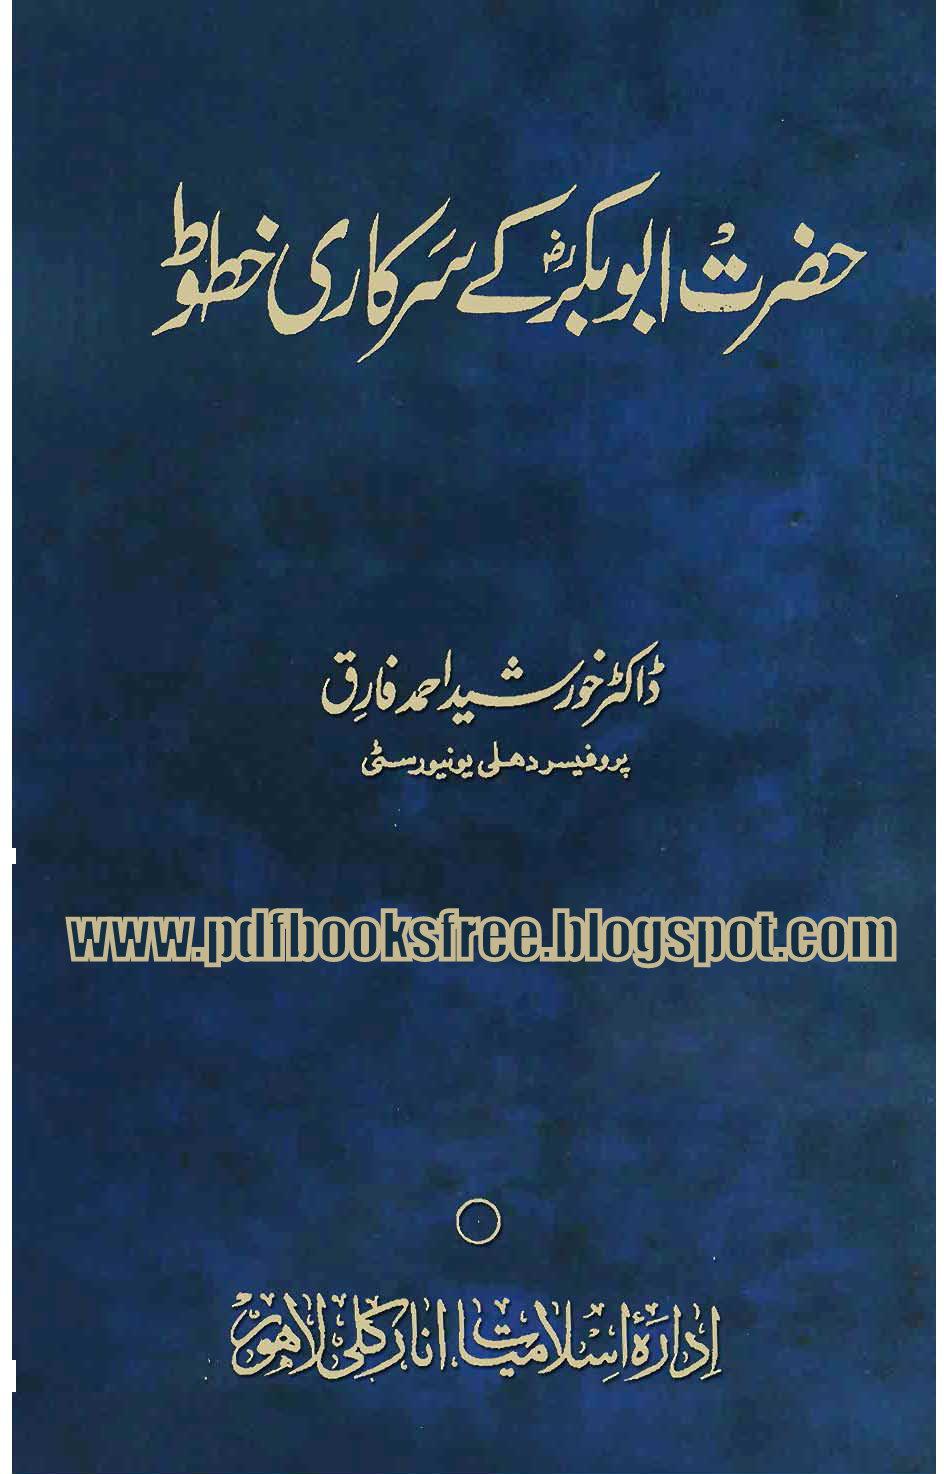 Hazrat abu bakr Coursework Sample - akmcleaningservices com